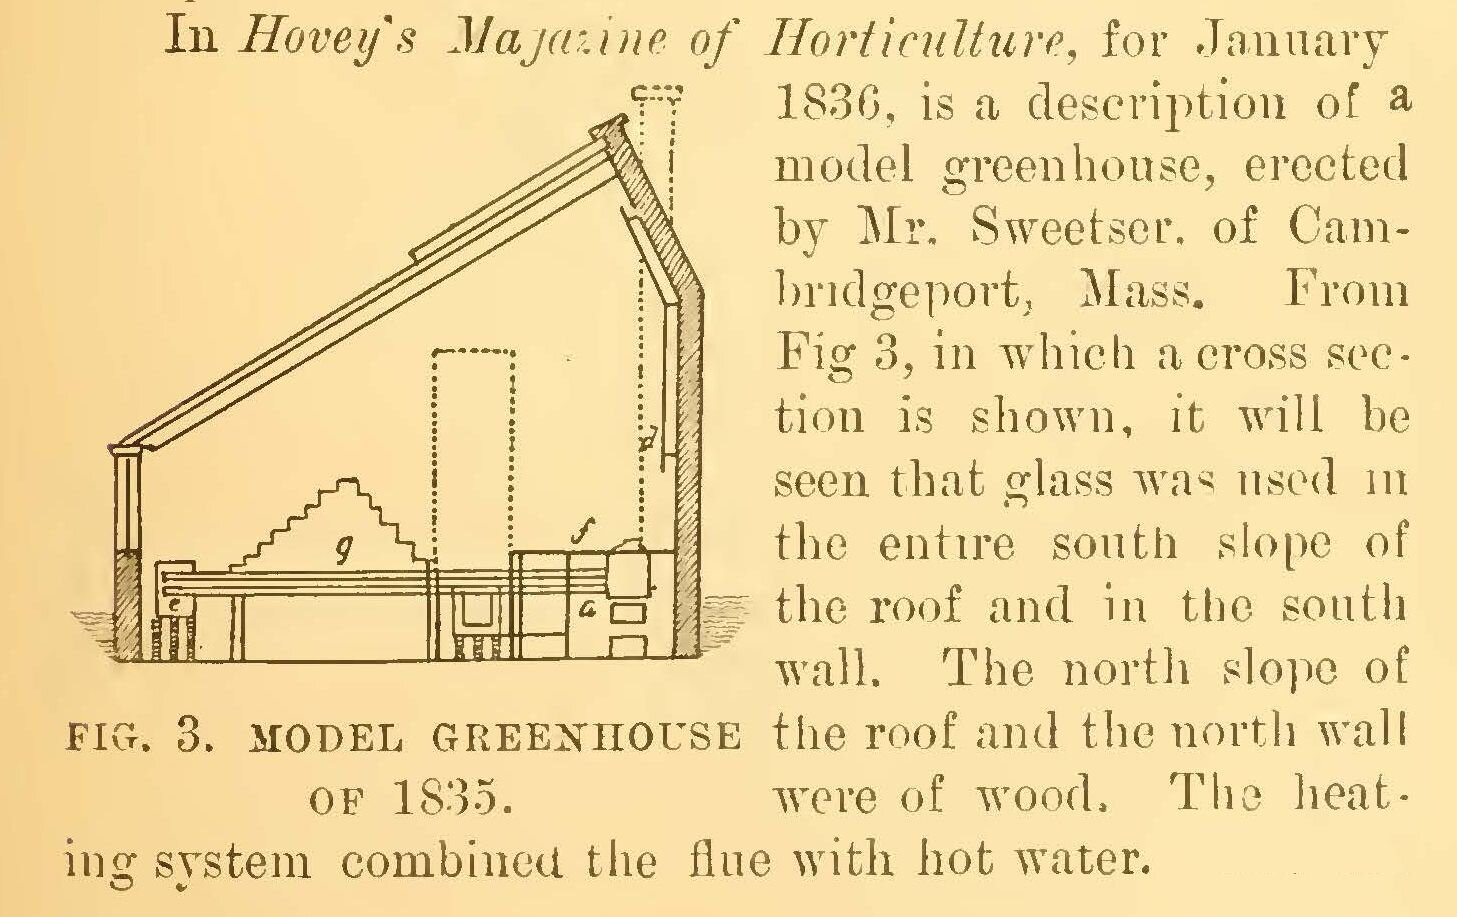 G4b Figure 1 Model Greenhouse of 1835.jpg